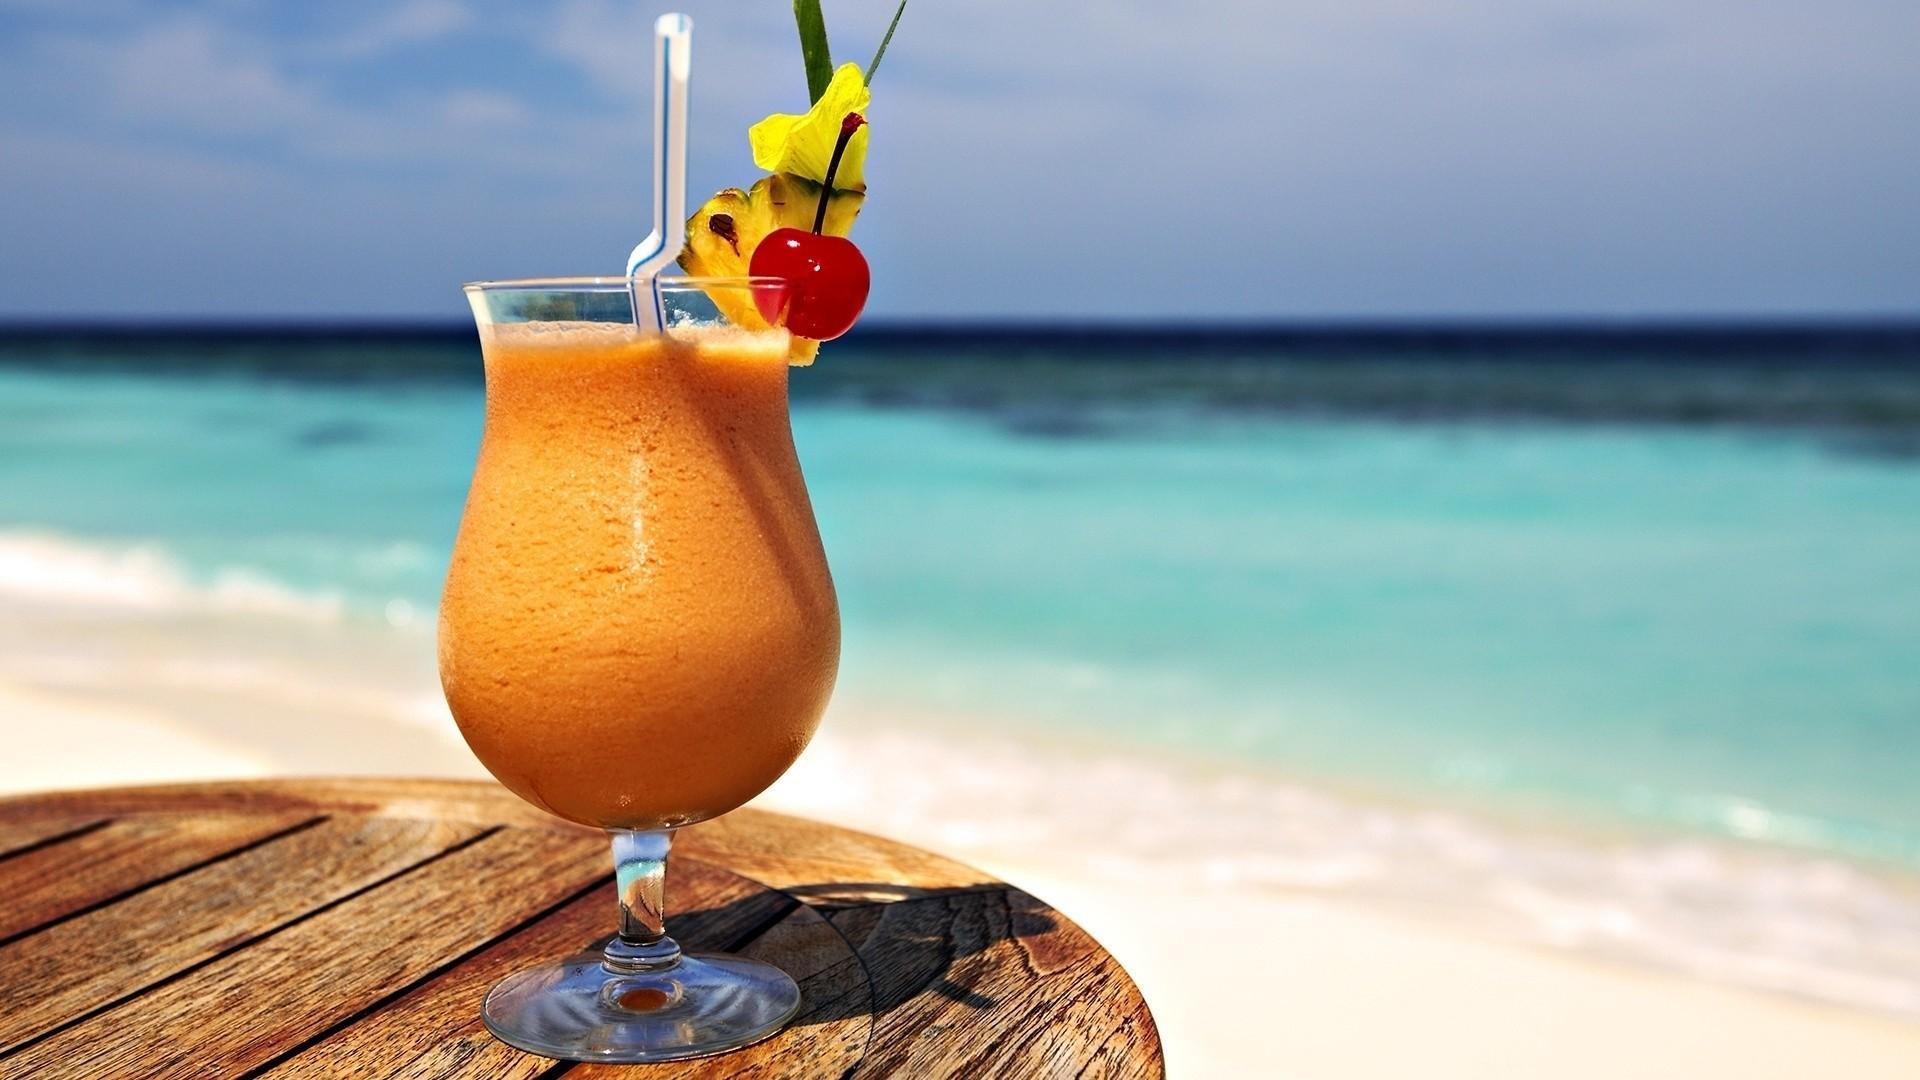 Wallpaper cocktail, dense, tubule, pineapple, beach